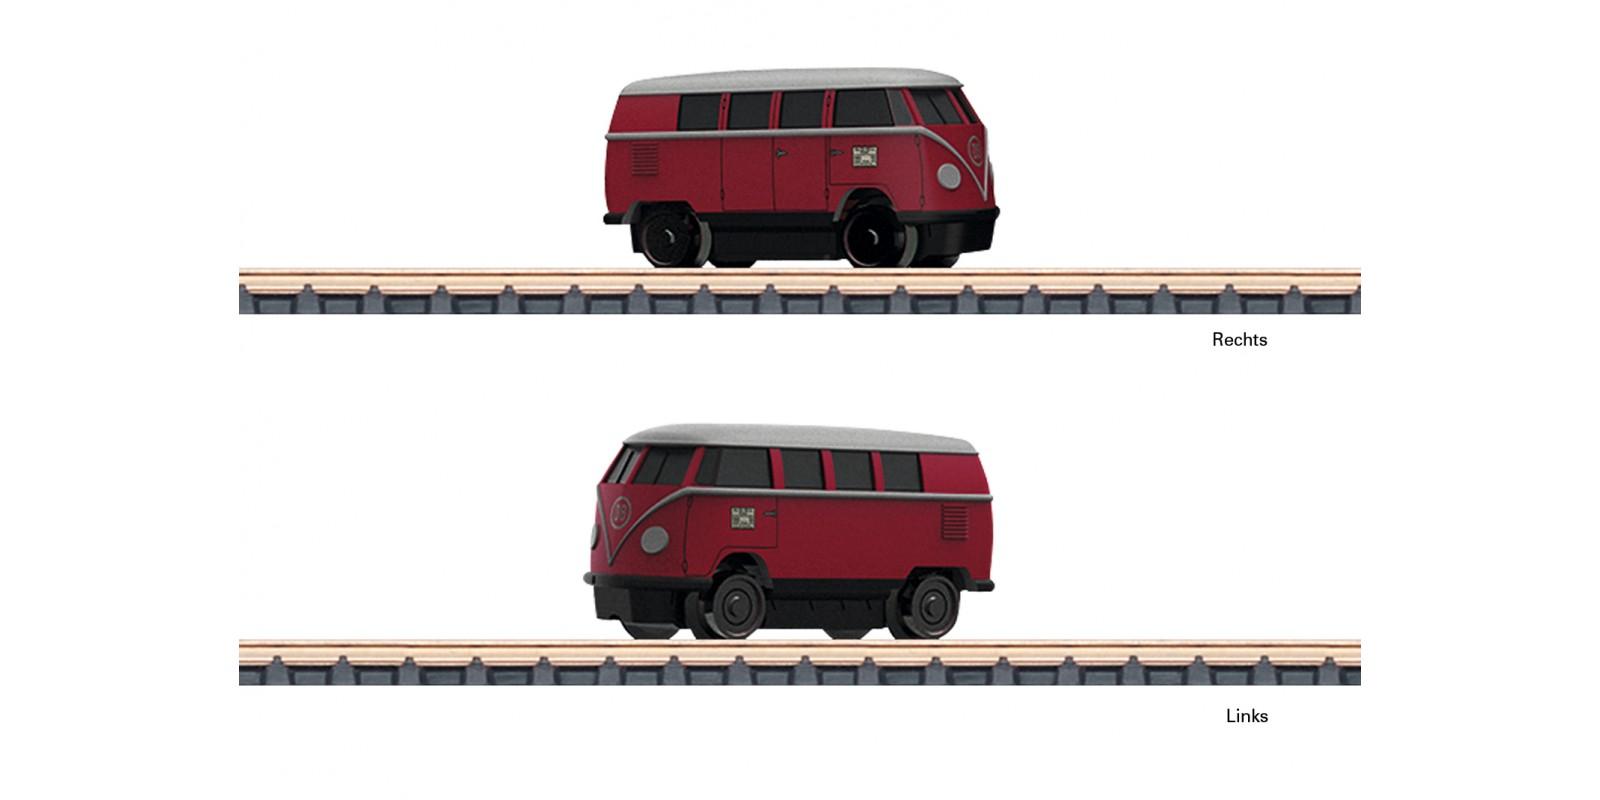 88025 Class Klv 20 Small Car